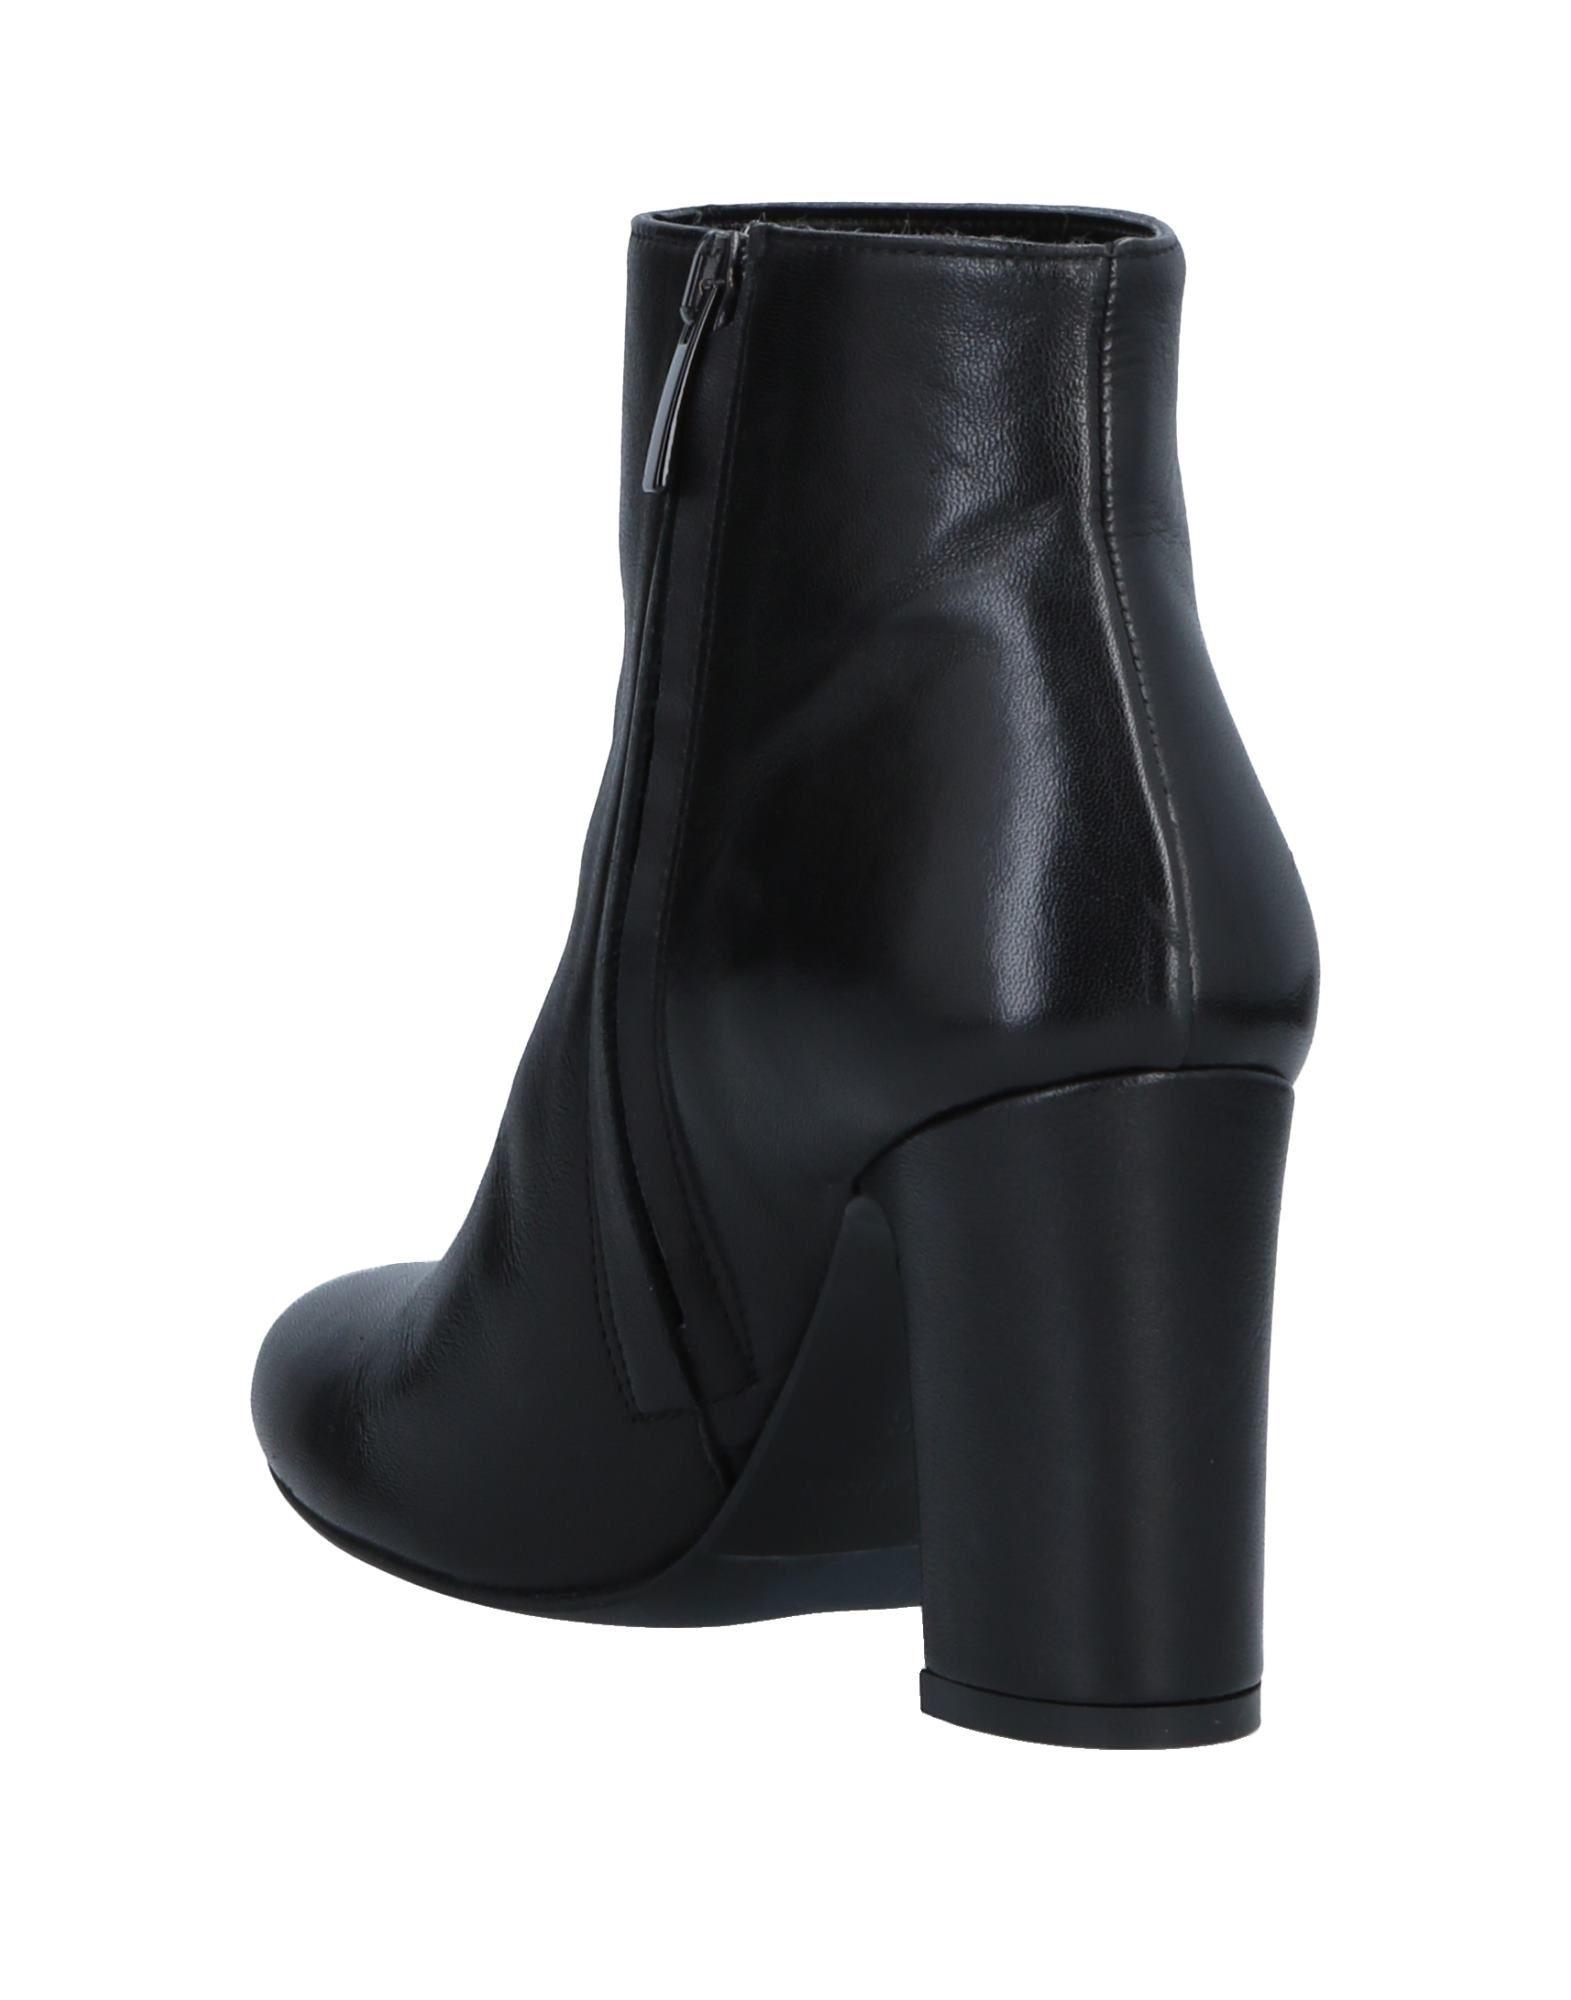 Me+ By Marc Ellis Stiefelette Qualität Damen  11537445QO Gute Qualität Stiefelette beliebte Schuhe 8a9631